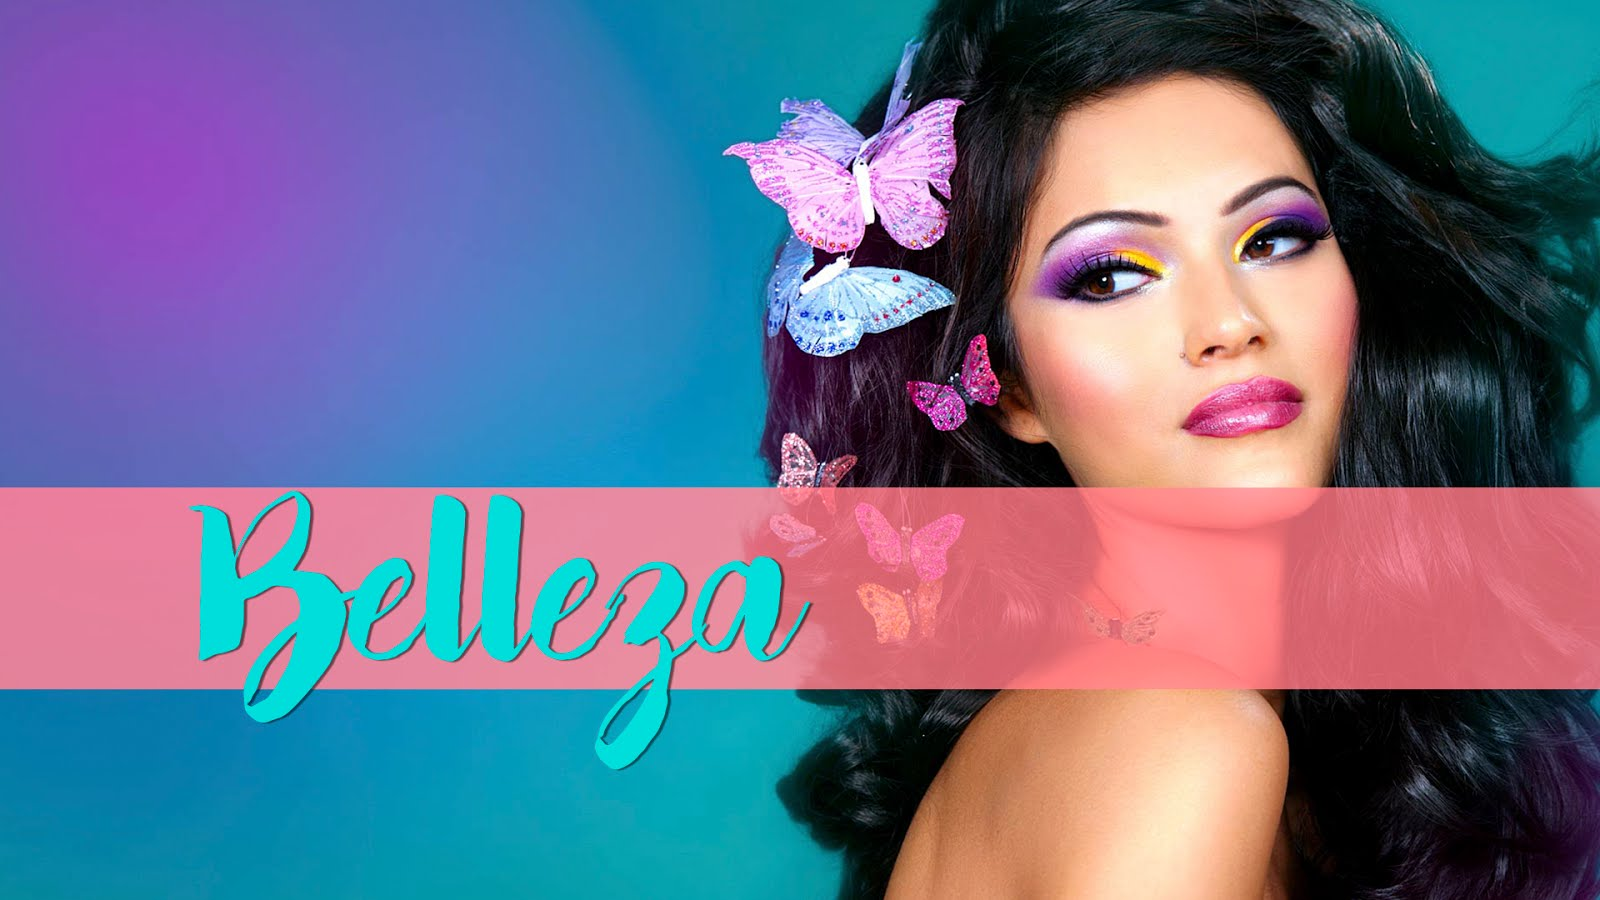 www.bridacoelho.com/search/label/Belleza